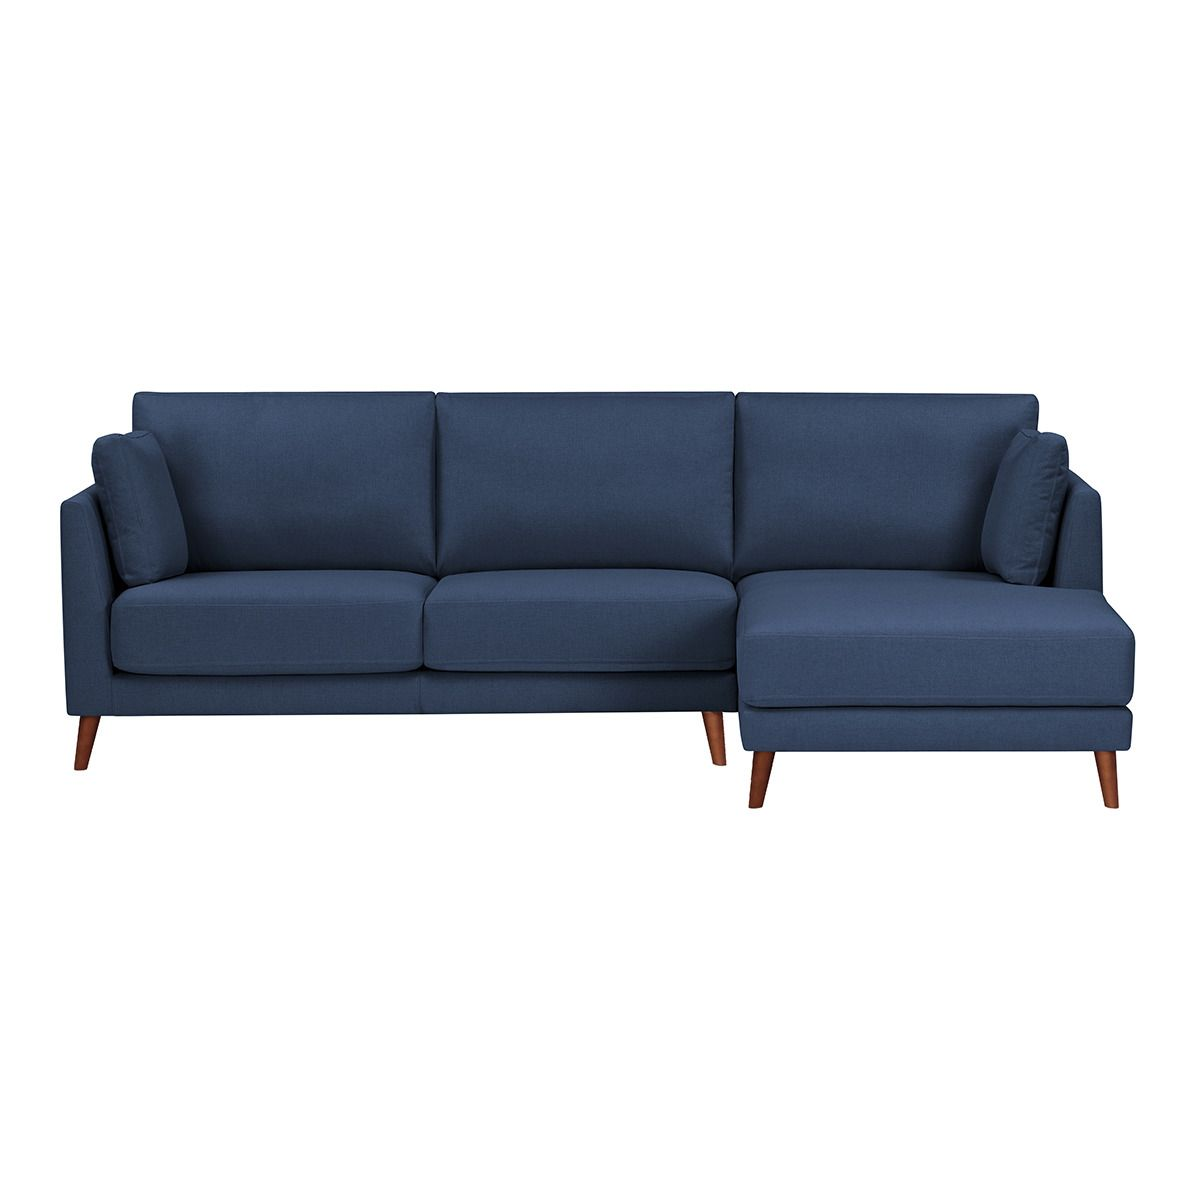 Groovy Sofa Tapizado De 2 Plazas Con Chaise Longue Derecha Azul Caraccident5 Cool Chair Designs And Ideas Caraccident5Info